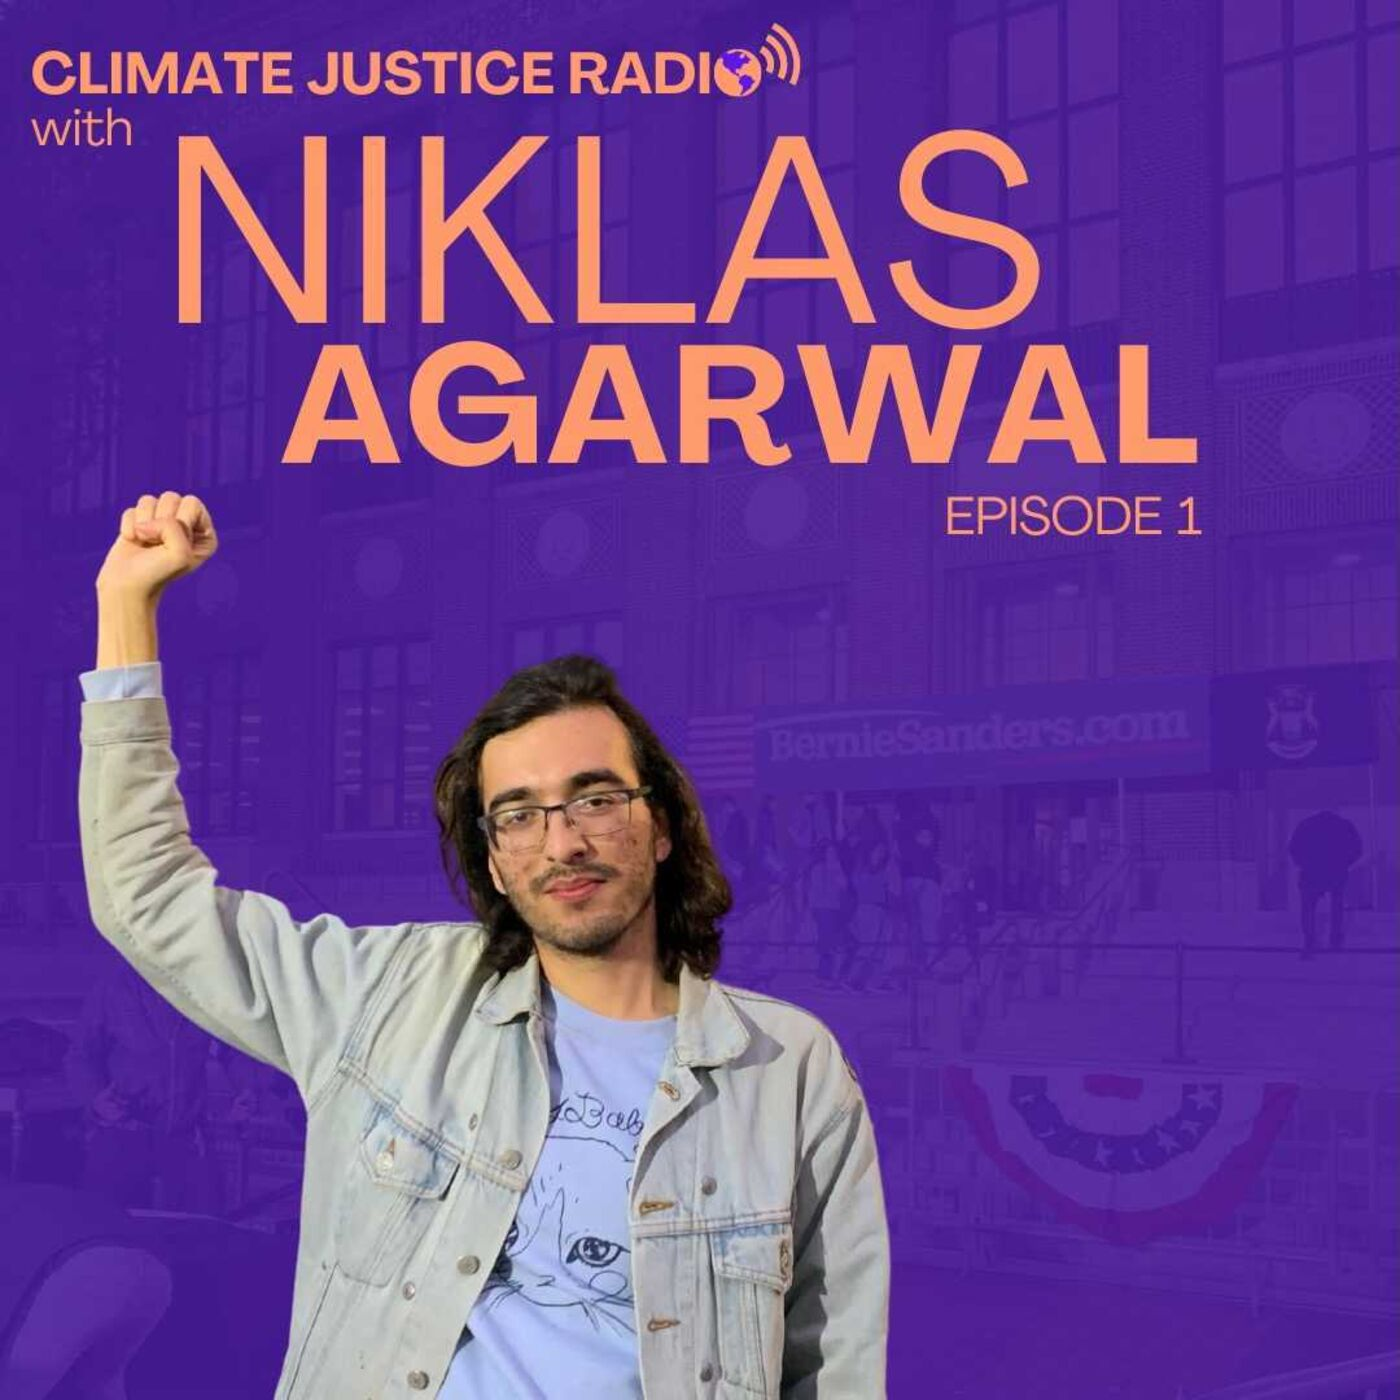 Episode 1 - Orientation with Niklas Agarwal